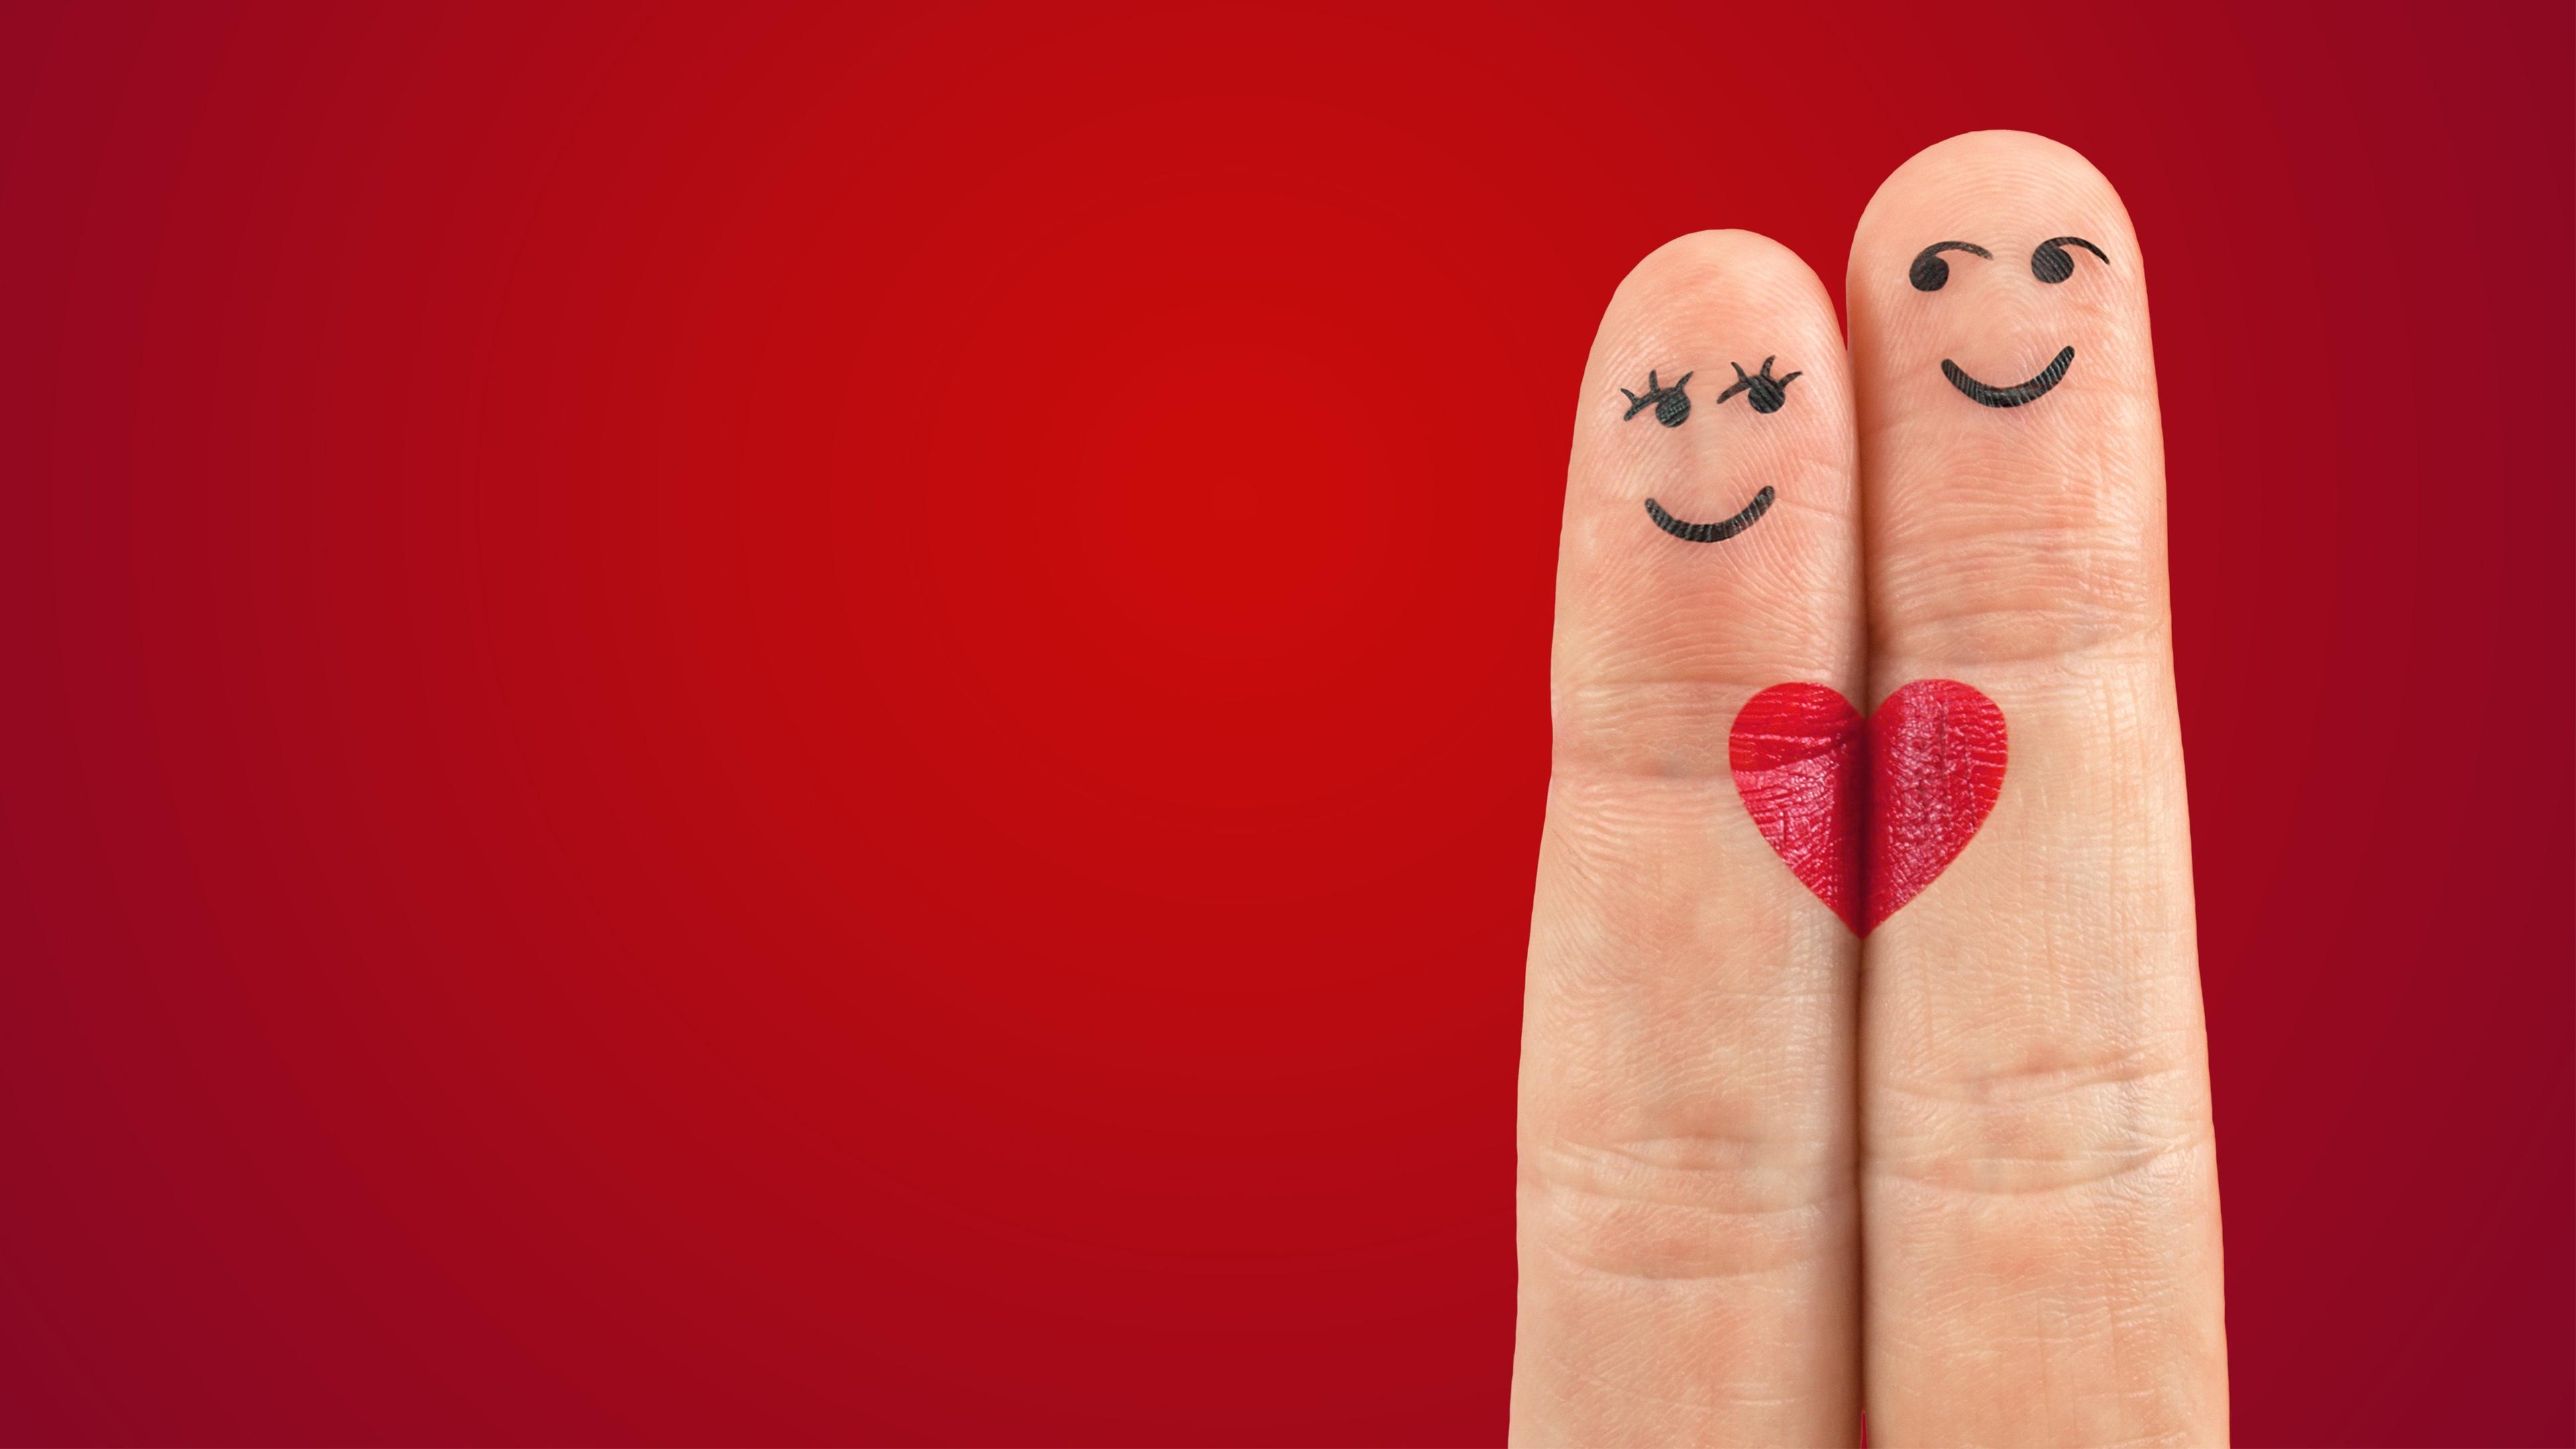 Love Pair Heart Fingers Wallpapers